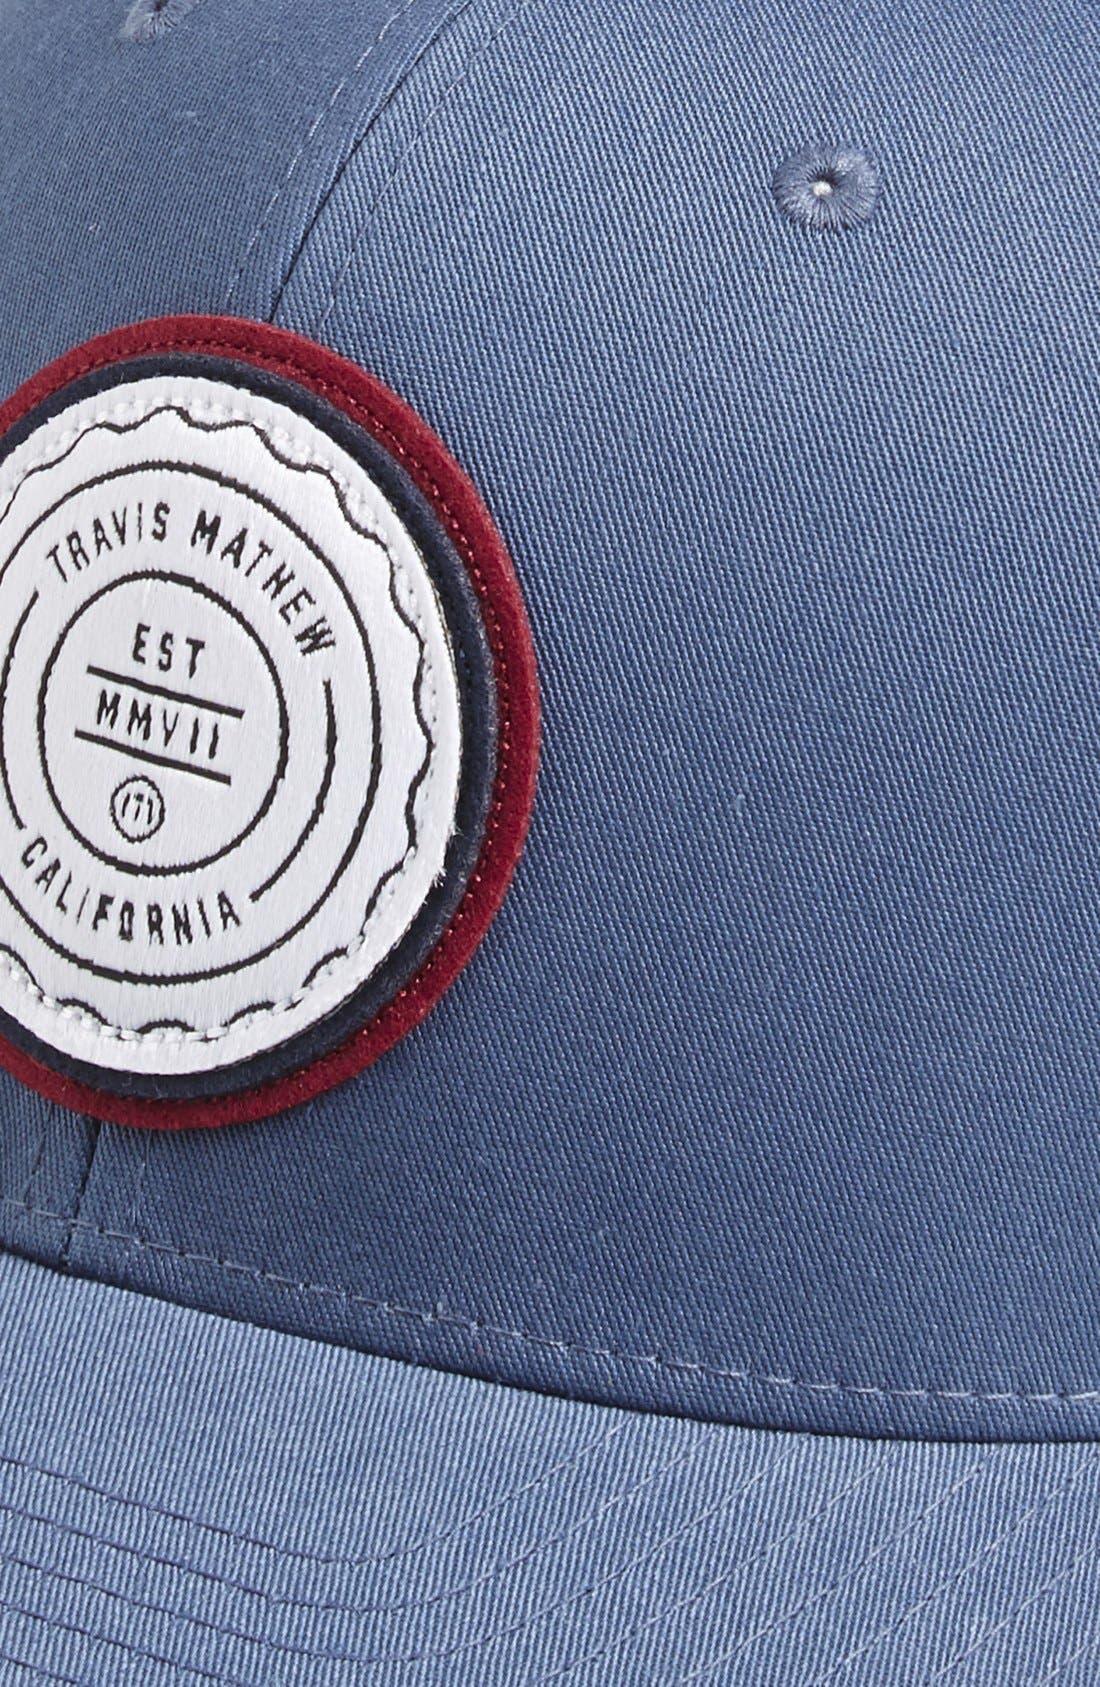 Alternate Image 2  - Travis Mathew 'Fringe' Trucker Hat